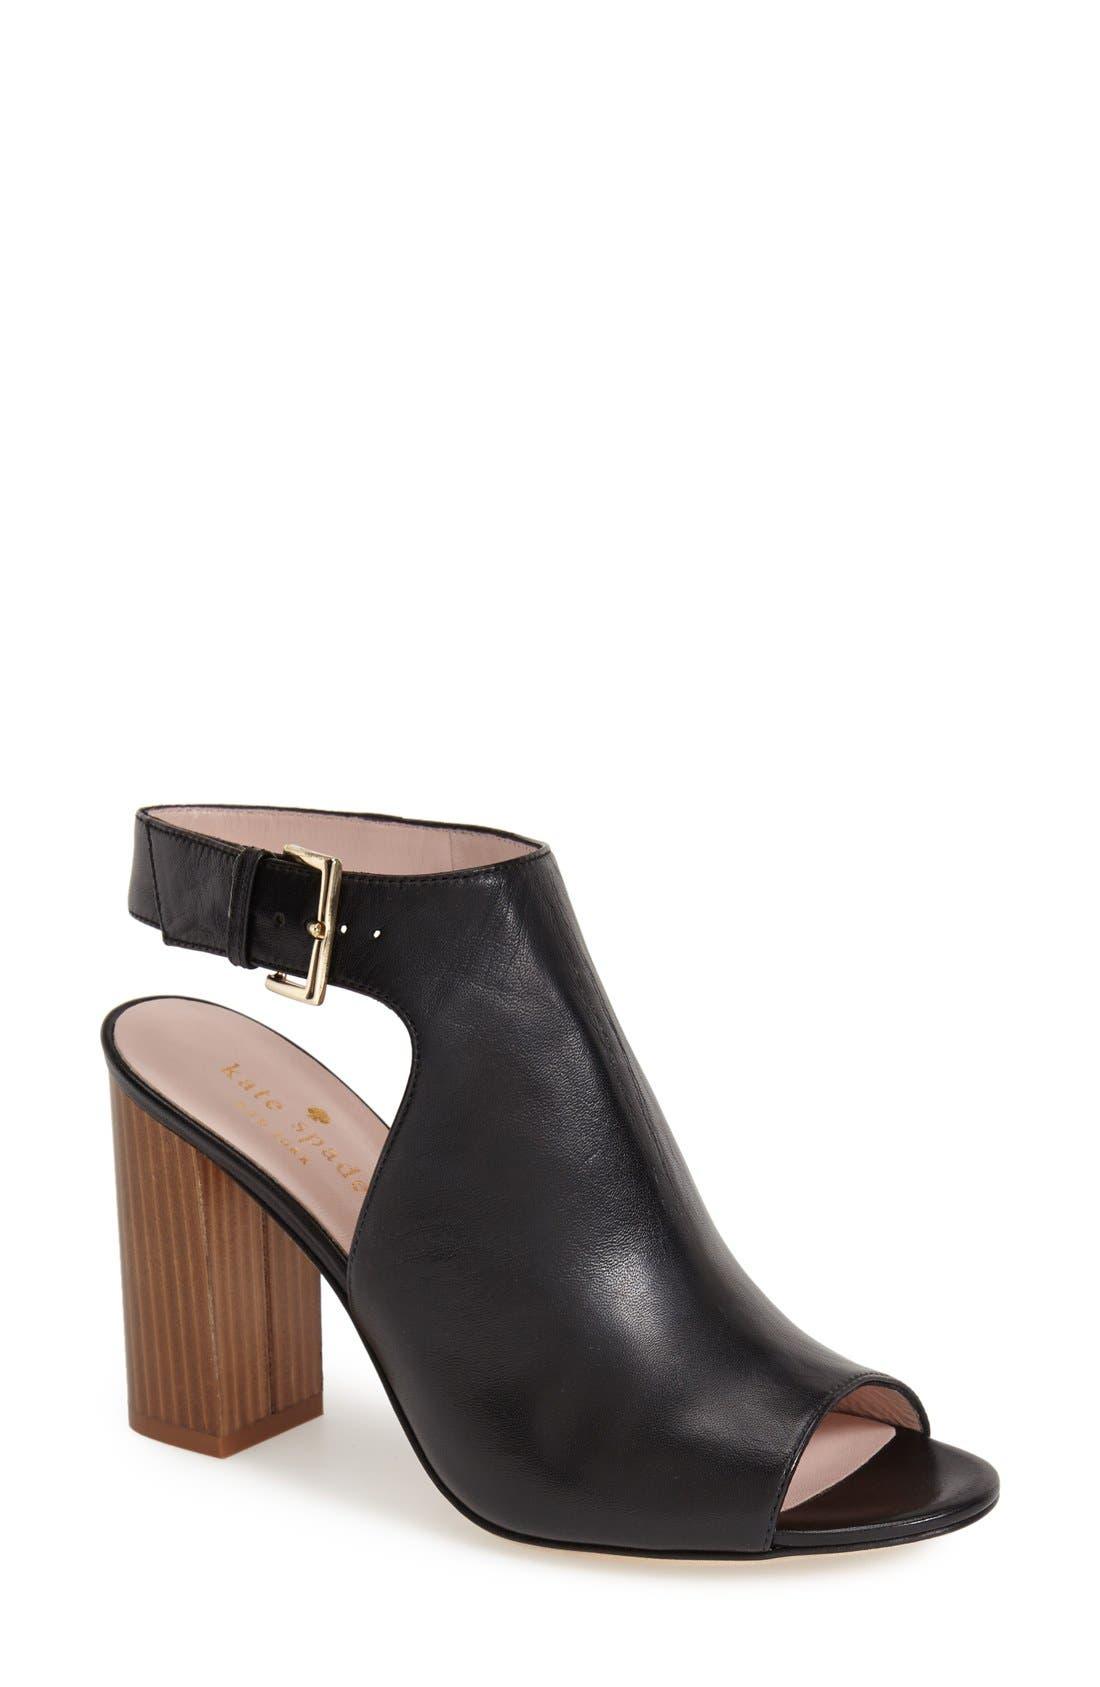 Main Image - kate spade new york 'ingrada' slingback sandal (Women)